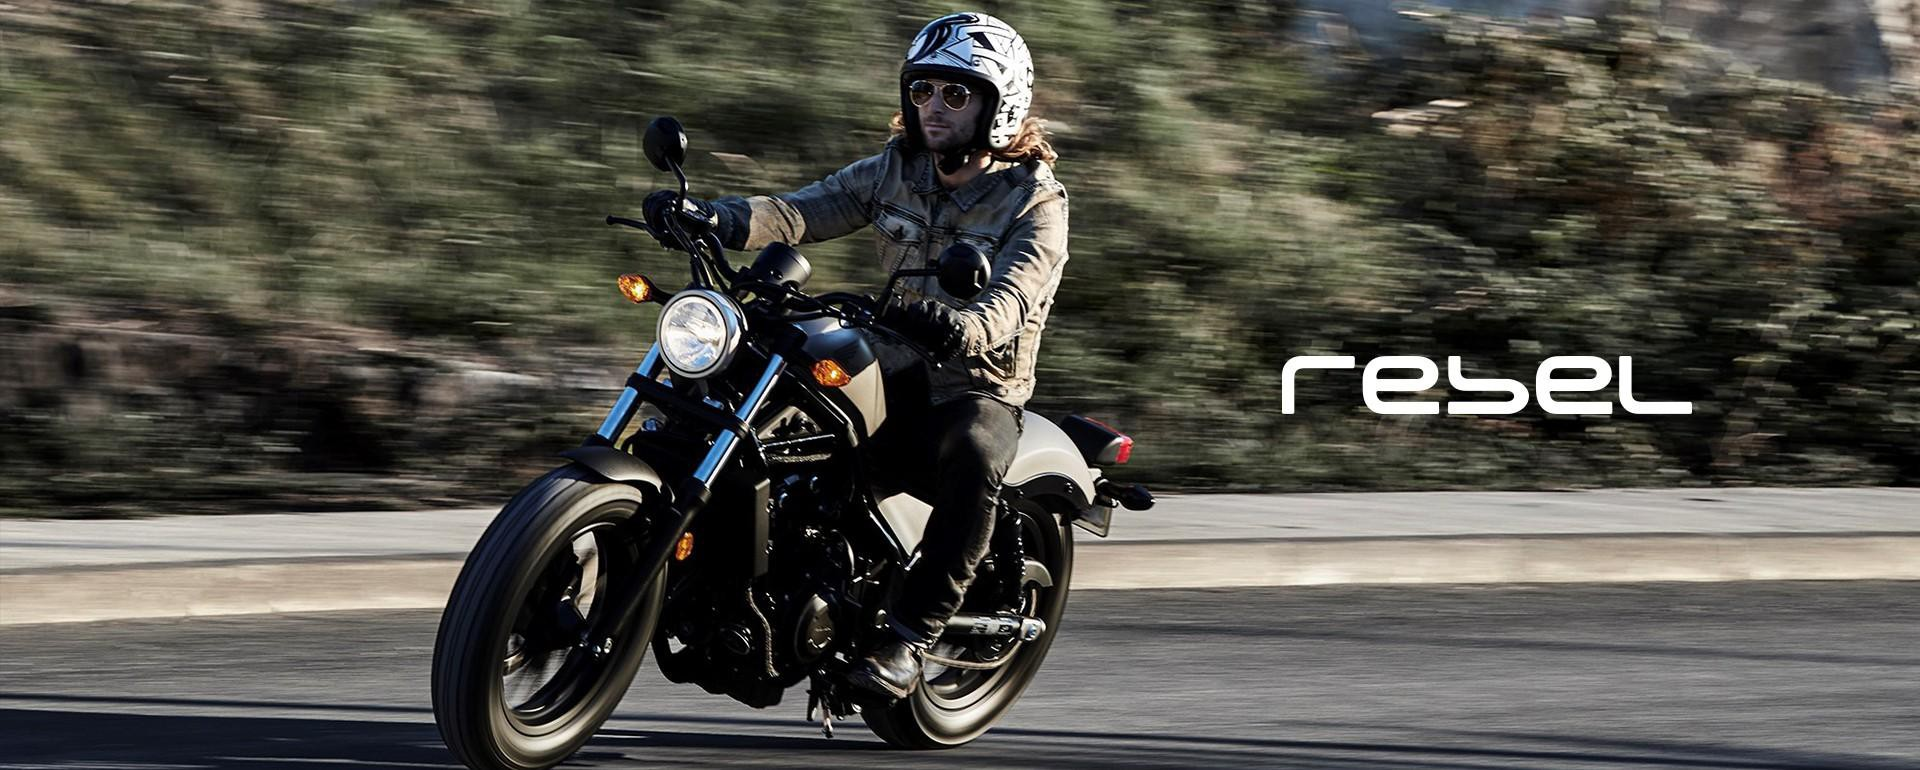 Honda-bigbike-Motorcycle-มอเตอร์ไซค์-บิ๊กไบค์-ฮอนด้า-rebel-500-banner